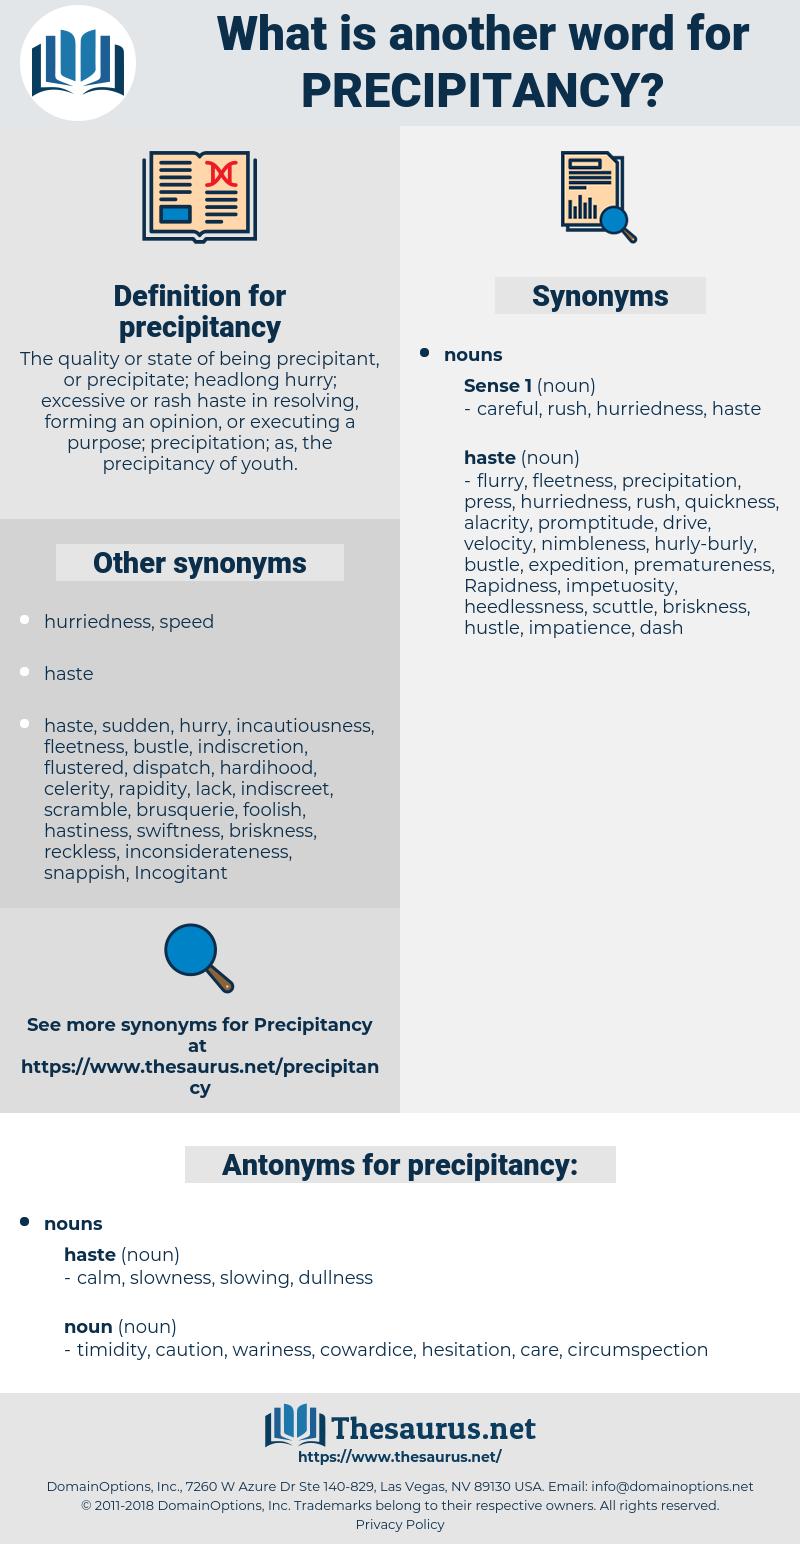 precipitancy, synonym precipitancy, another word for precipitancy, words like precipitancy, thesaurus precipitancy